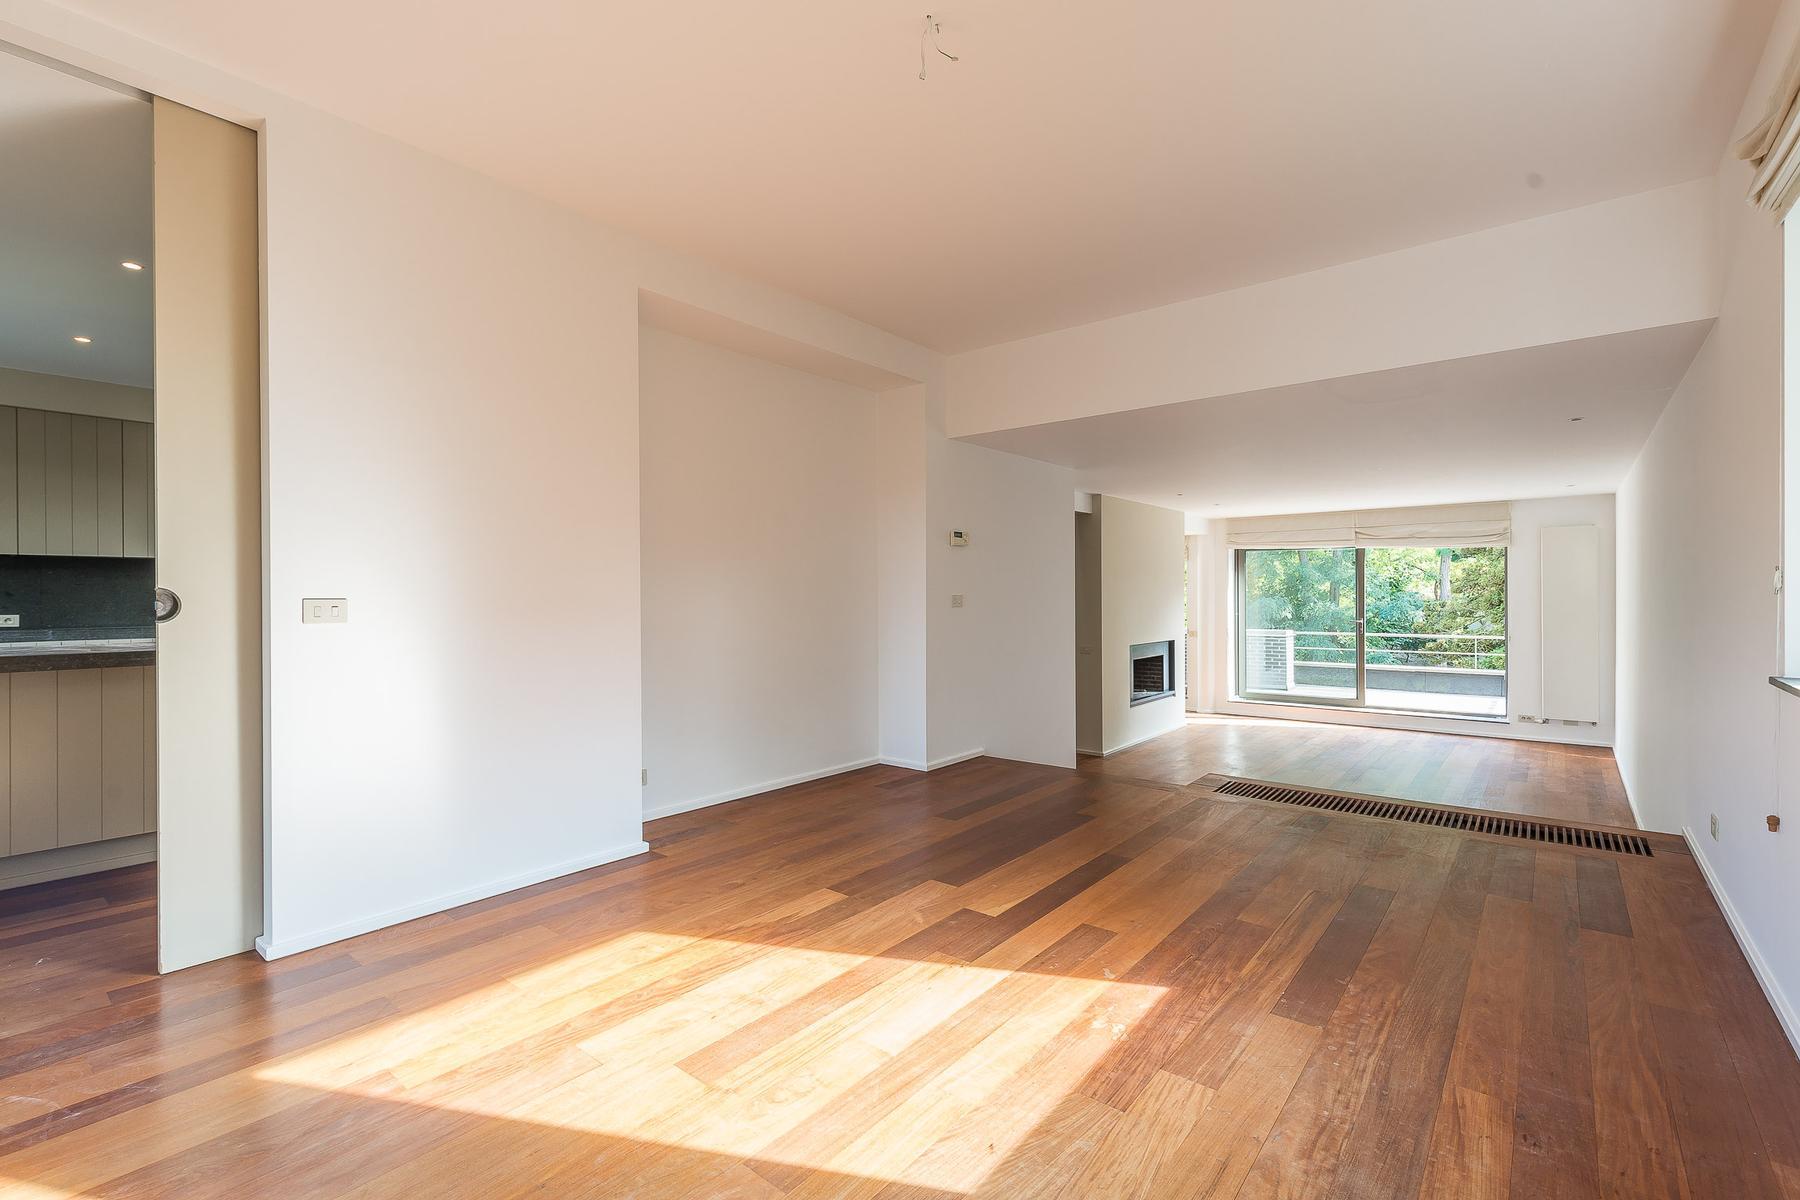 Apartment for Rent at Uccle I Vert Chasseur 20 Avenue du Maréchal Brussels, Brussels, 1180 Belgium